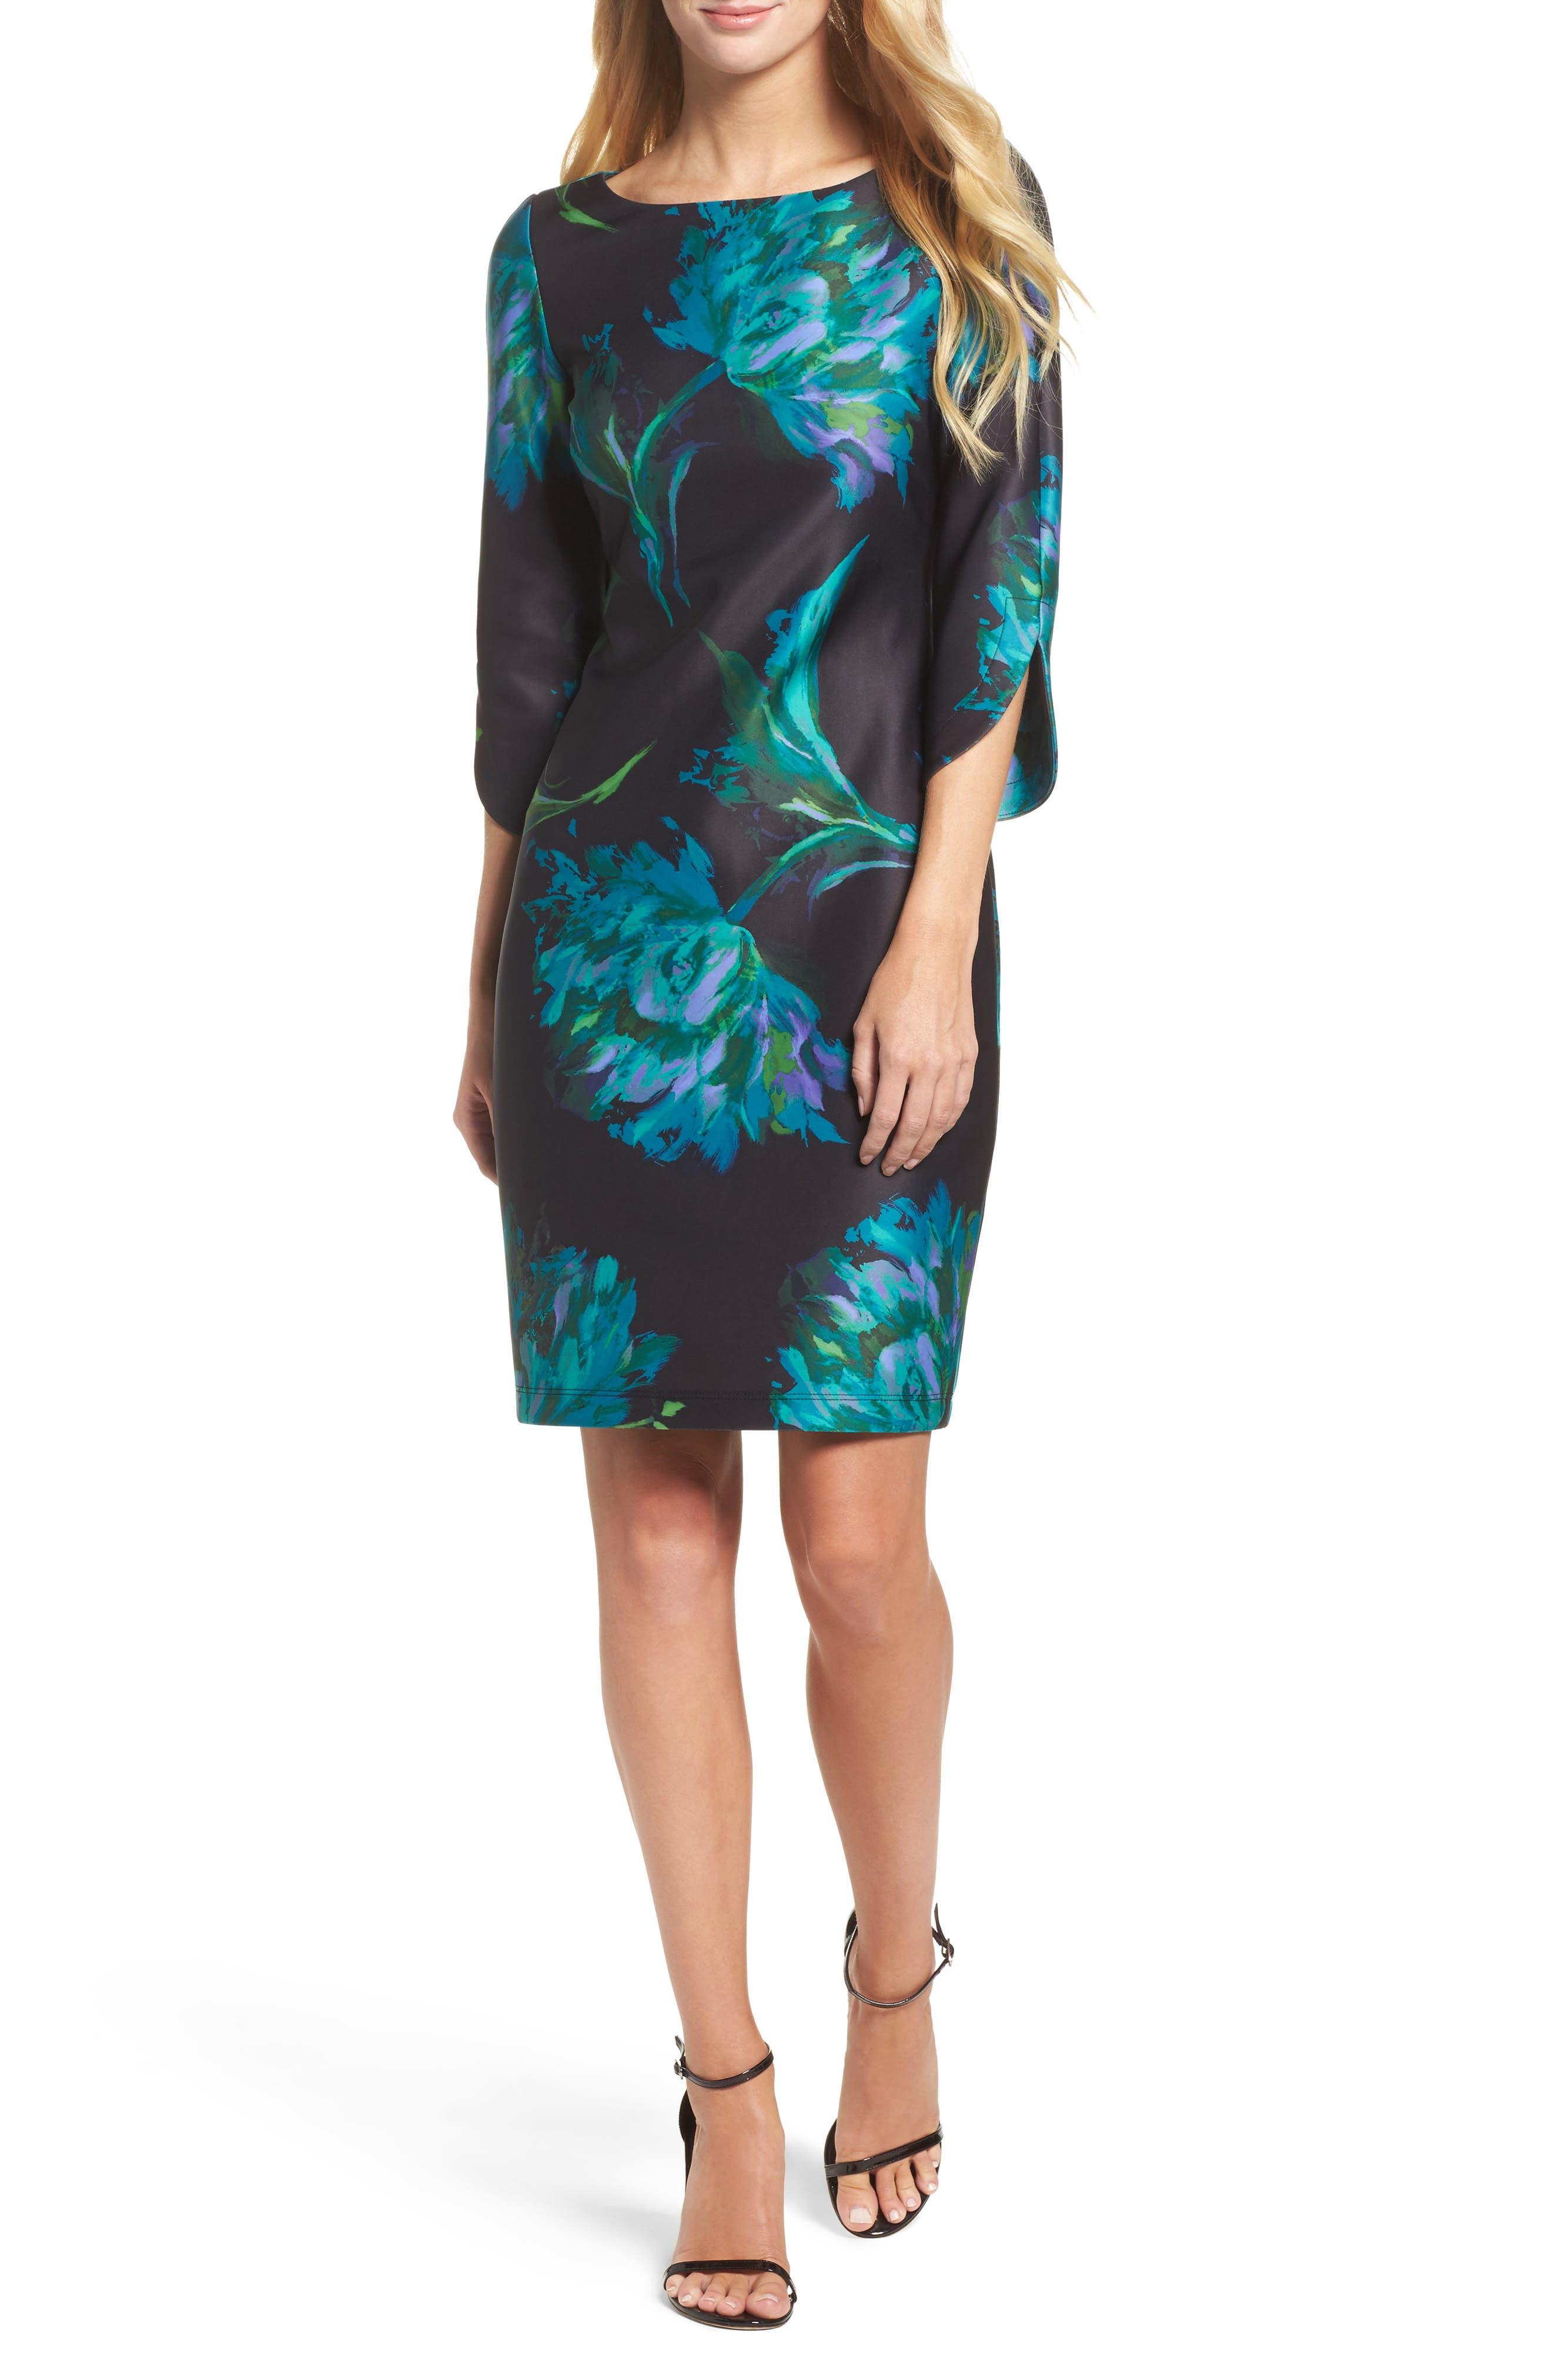 Gabby Skye Floral Print Shift Dress